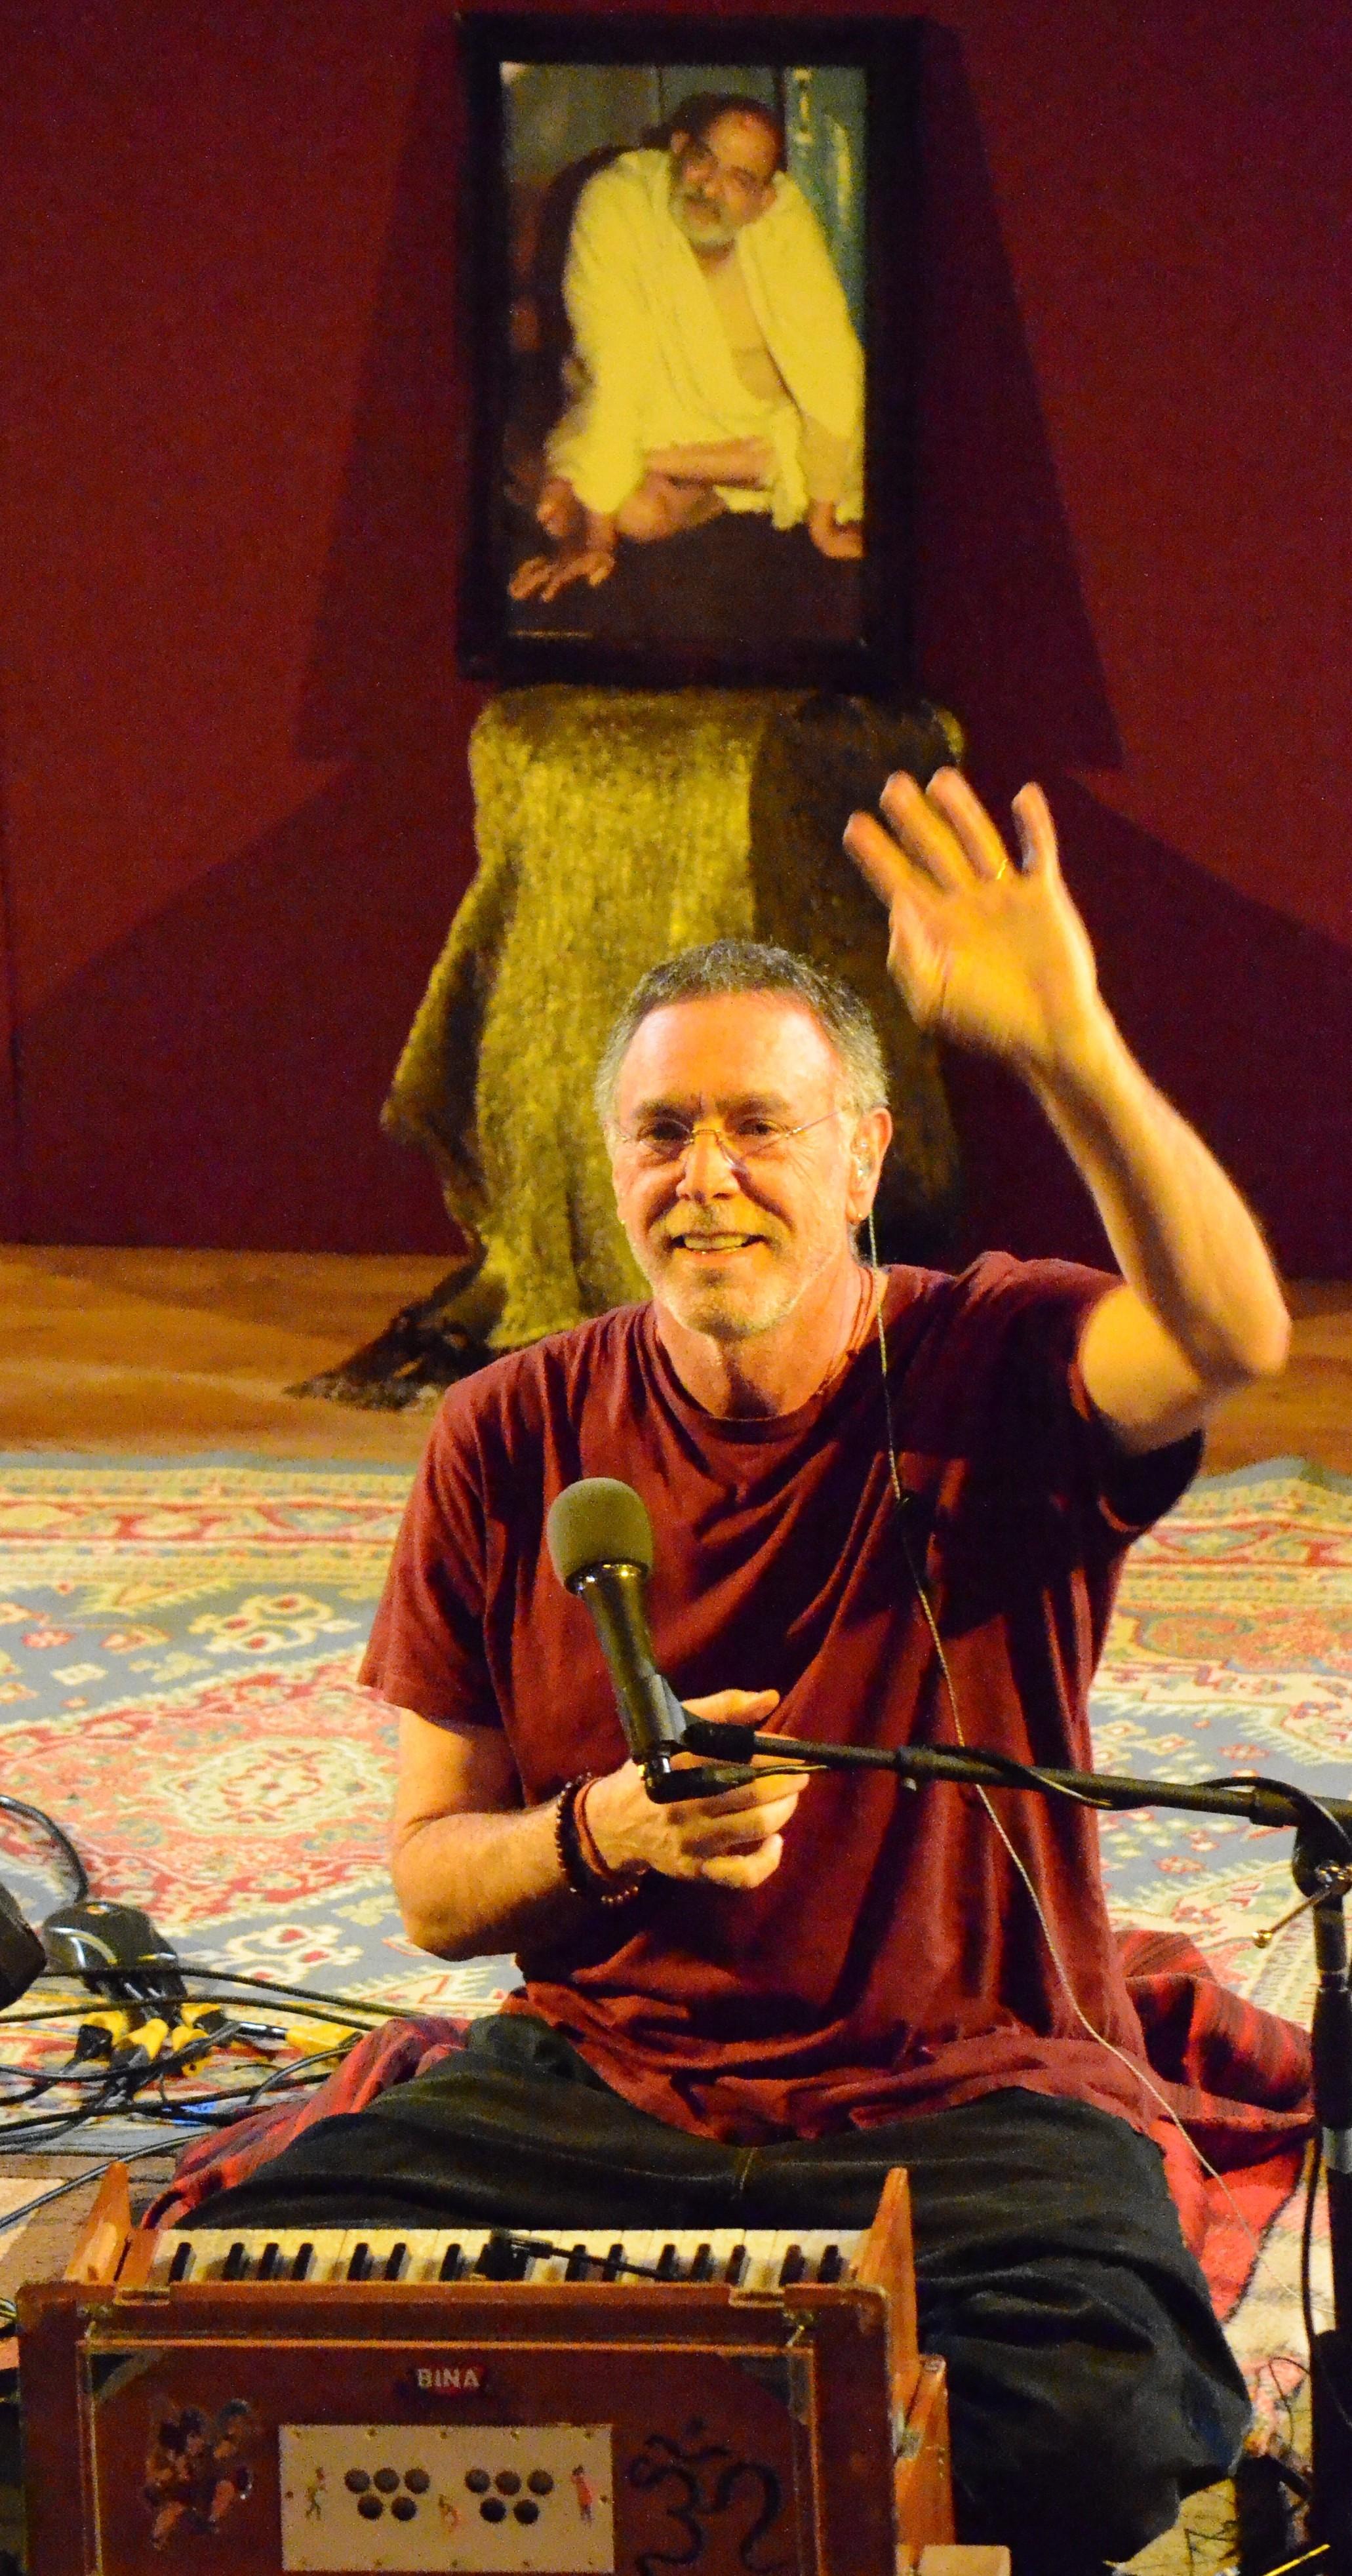 Krishna Das, Chantmaster, at Chantlanta, by TheBhaktiBeat.com